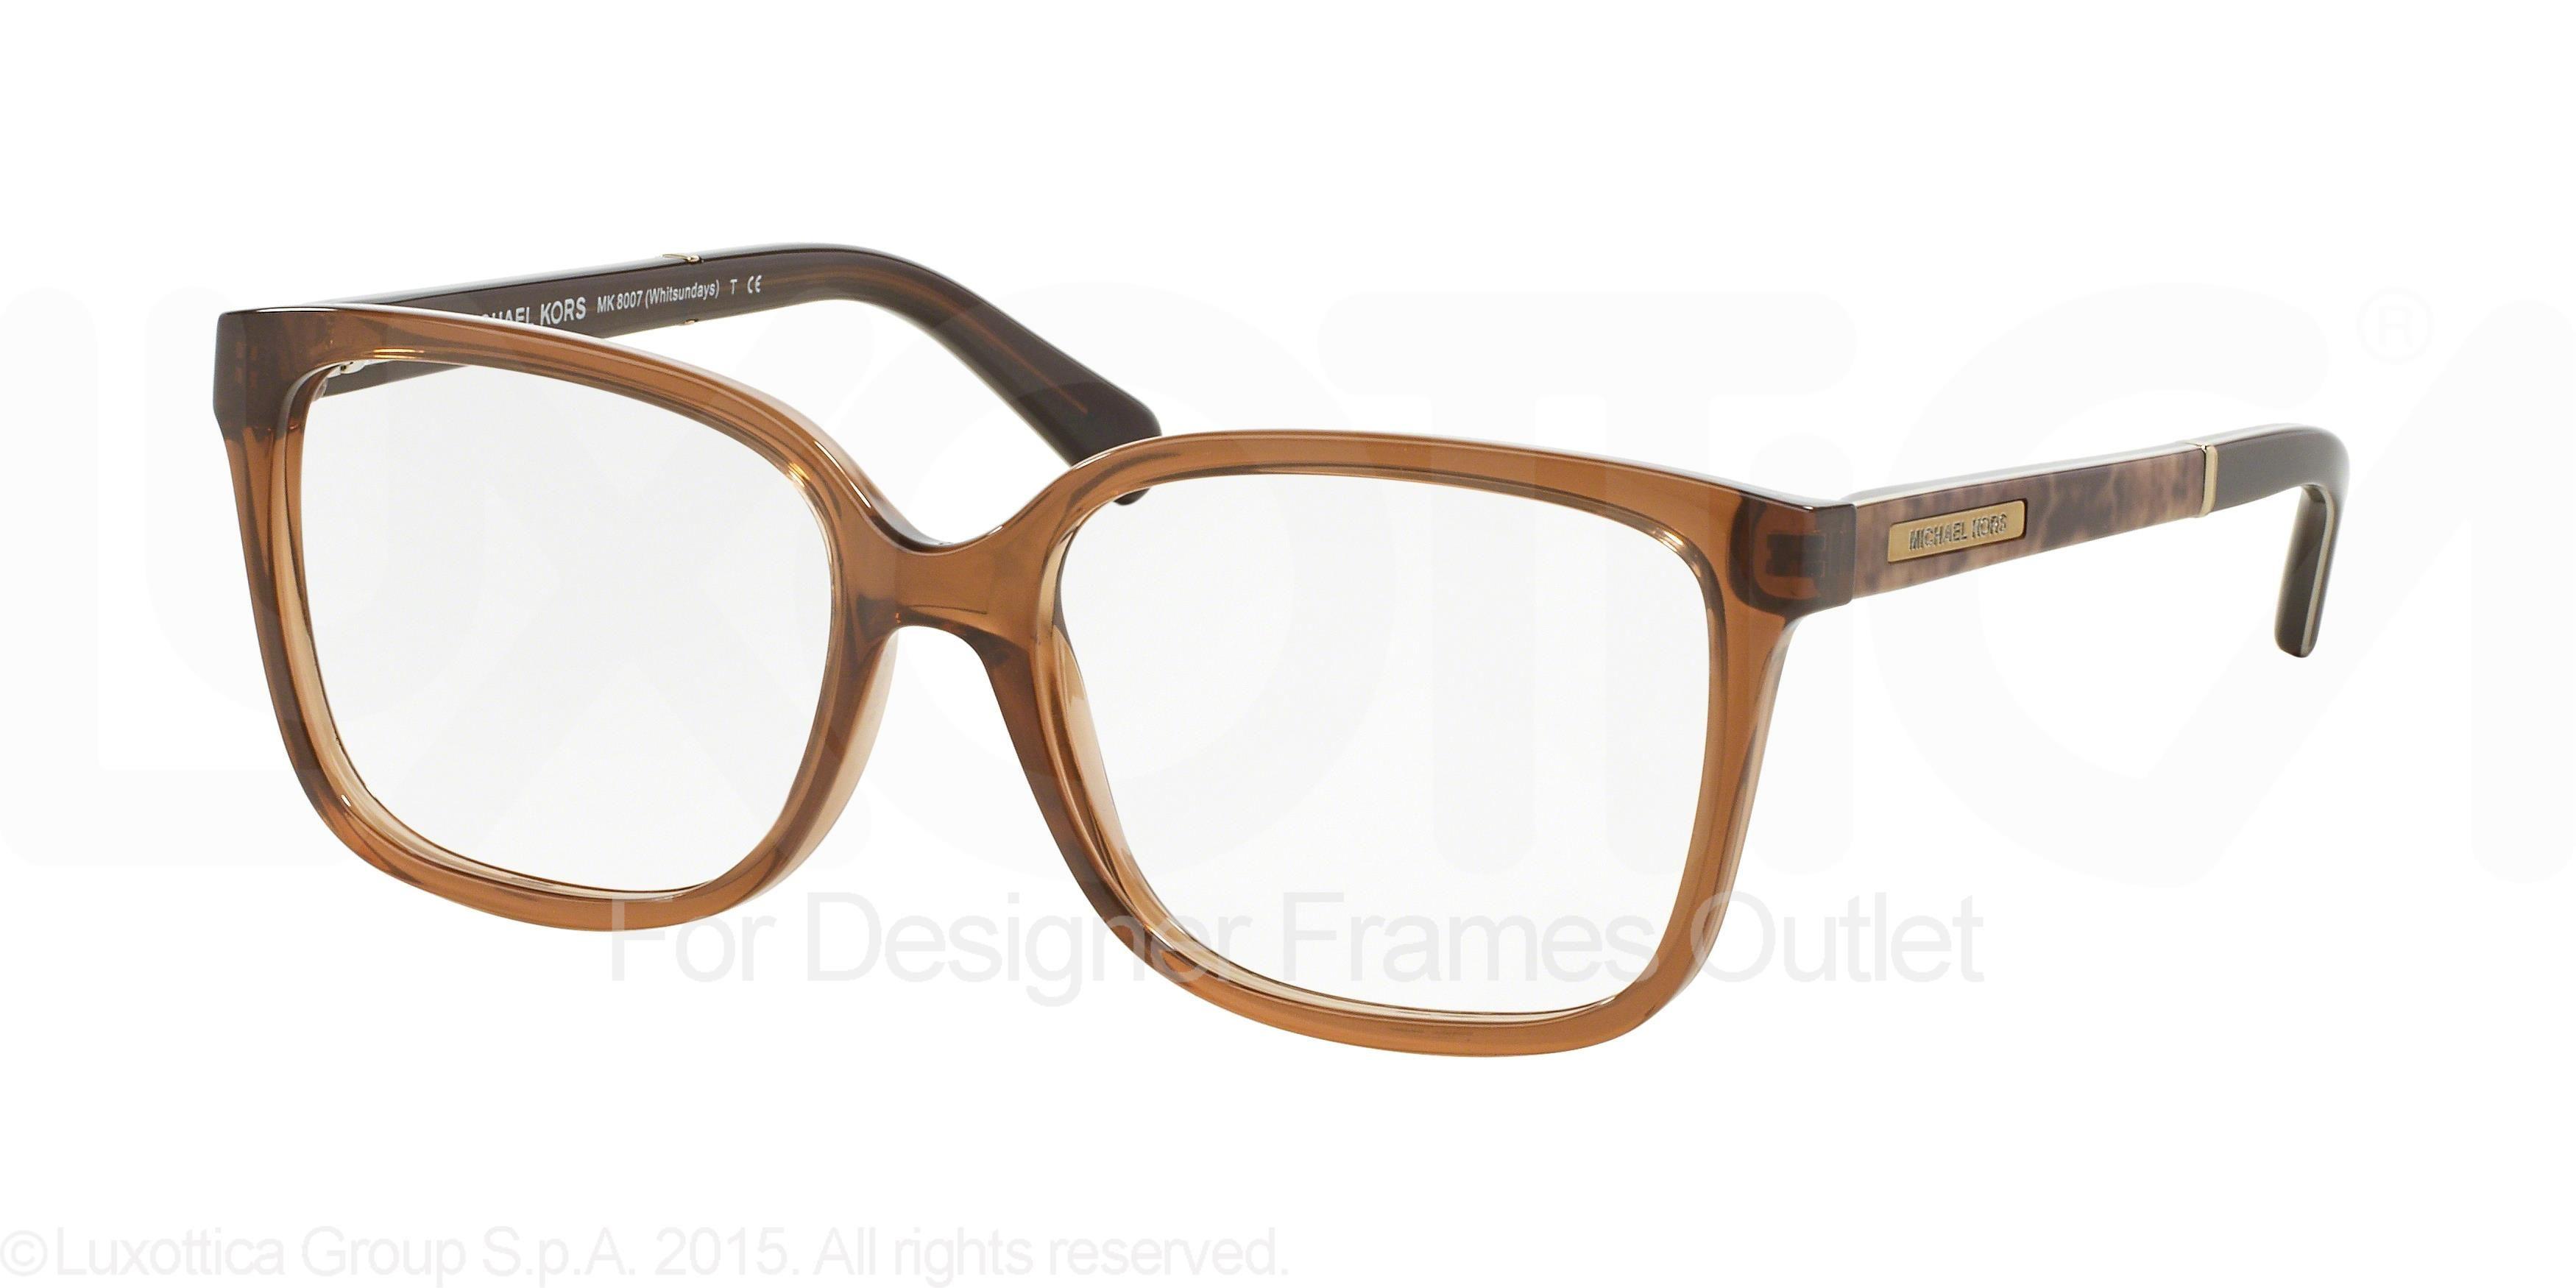 8ac3954dc4c Michael Kors Eyeglasses MK 8007 Michael Kors Eyeglasses